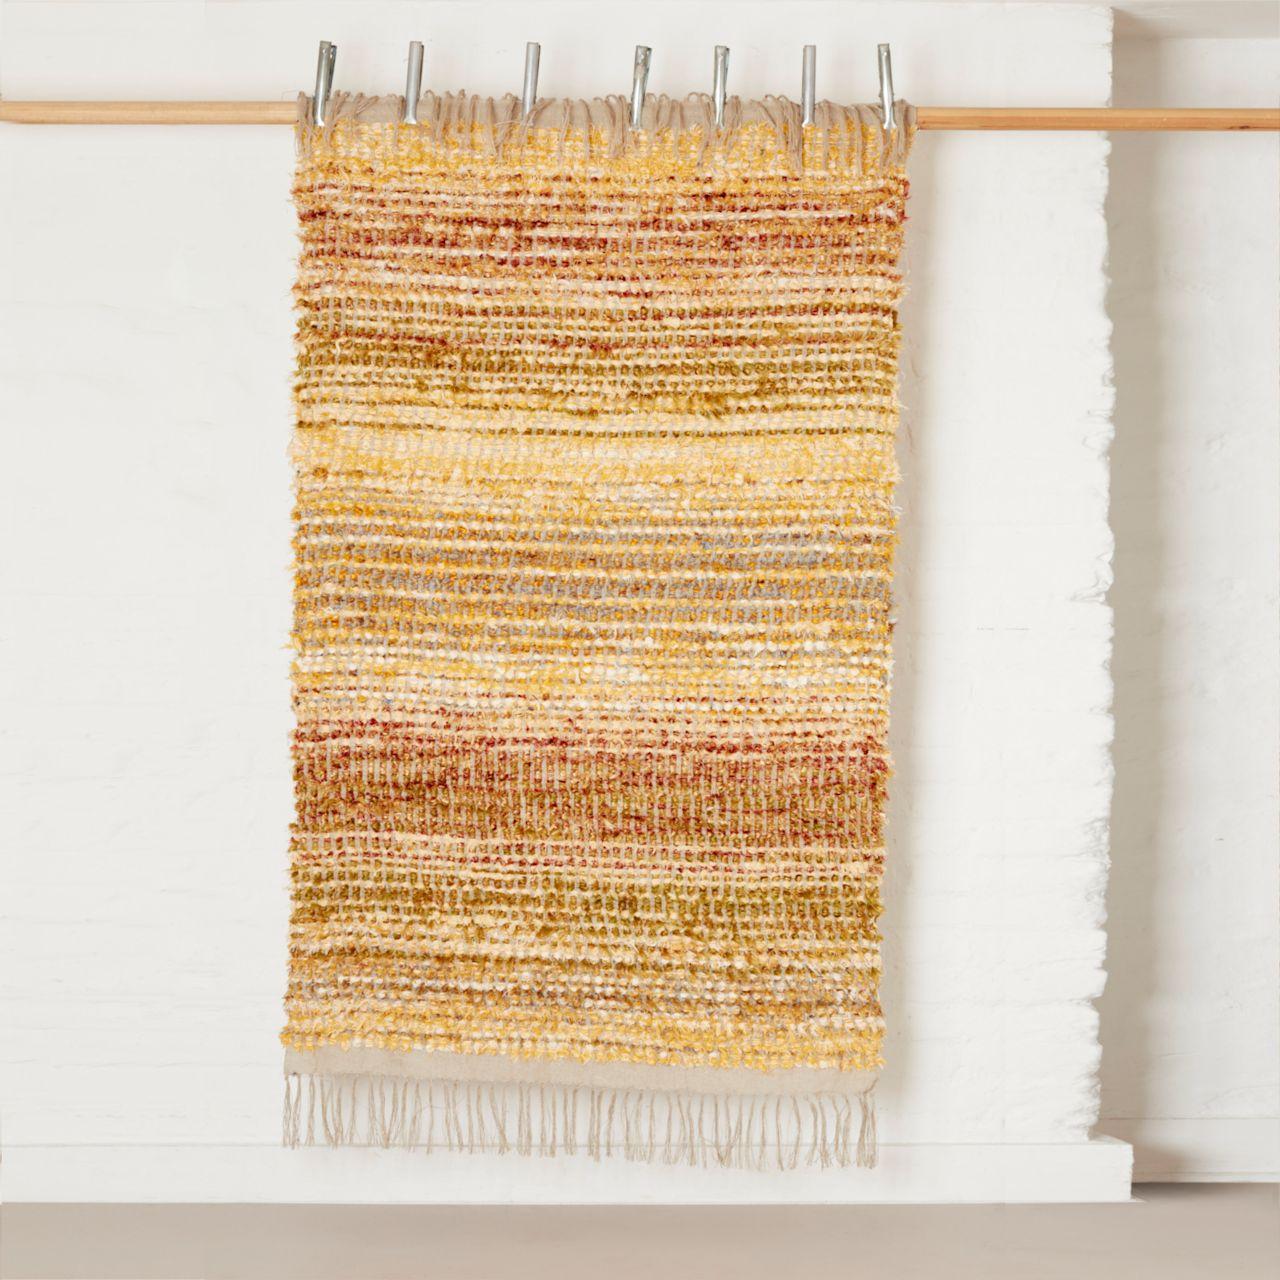 Bristol Weaving Mill, rag rug 'Yellow & grey', The New Craftsmen